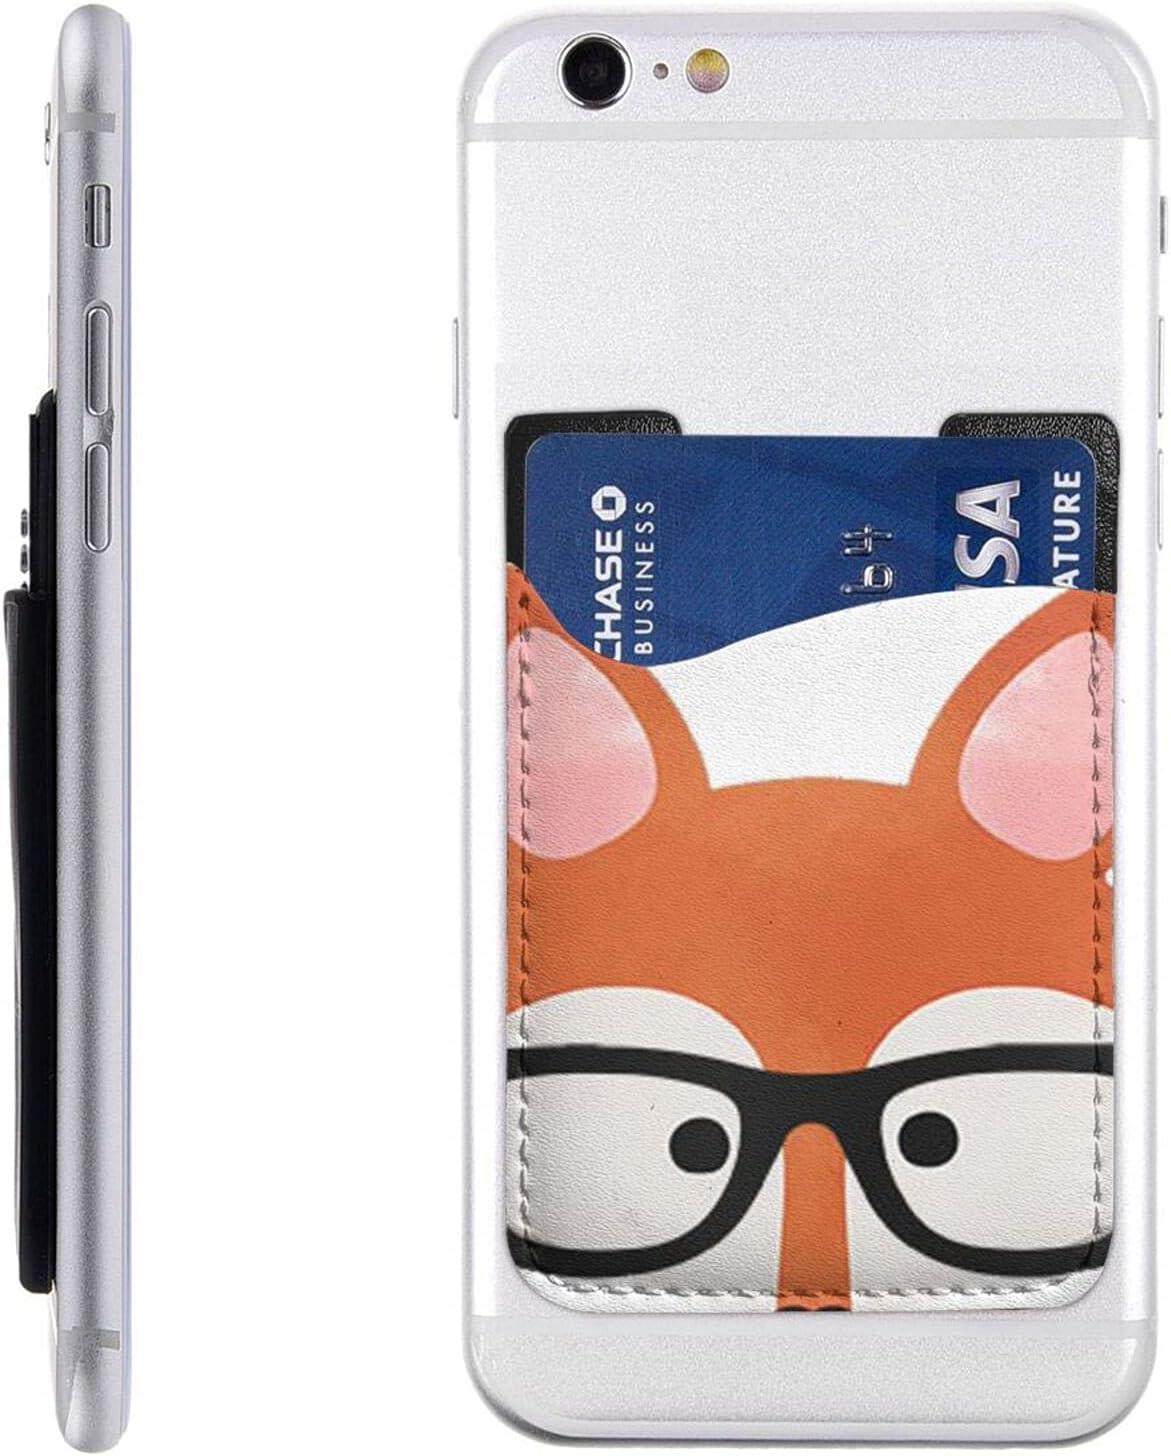 Cartoon Fox Head Phone Card Industry No. 1 Wall Holder Stick On Cell Oakland Mall